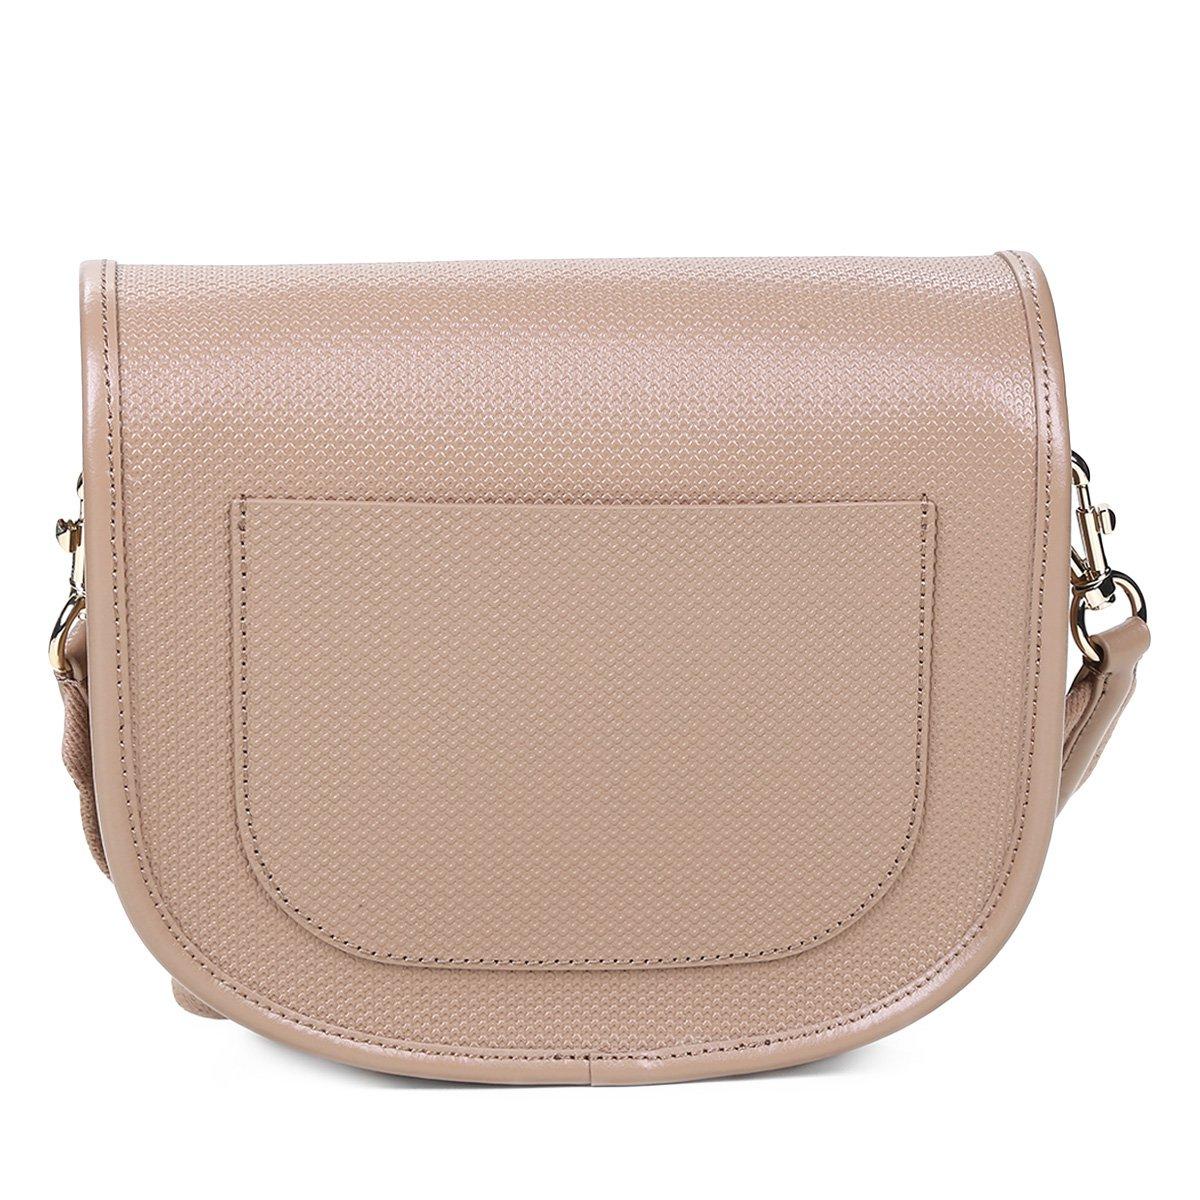 6b10f73cfc126 Bolsa Couro Lacoste Flap Feminina - Marrom Claro - Compre Agora ...